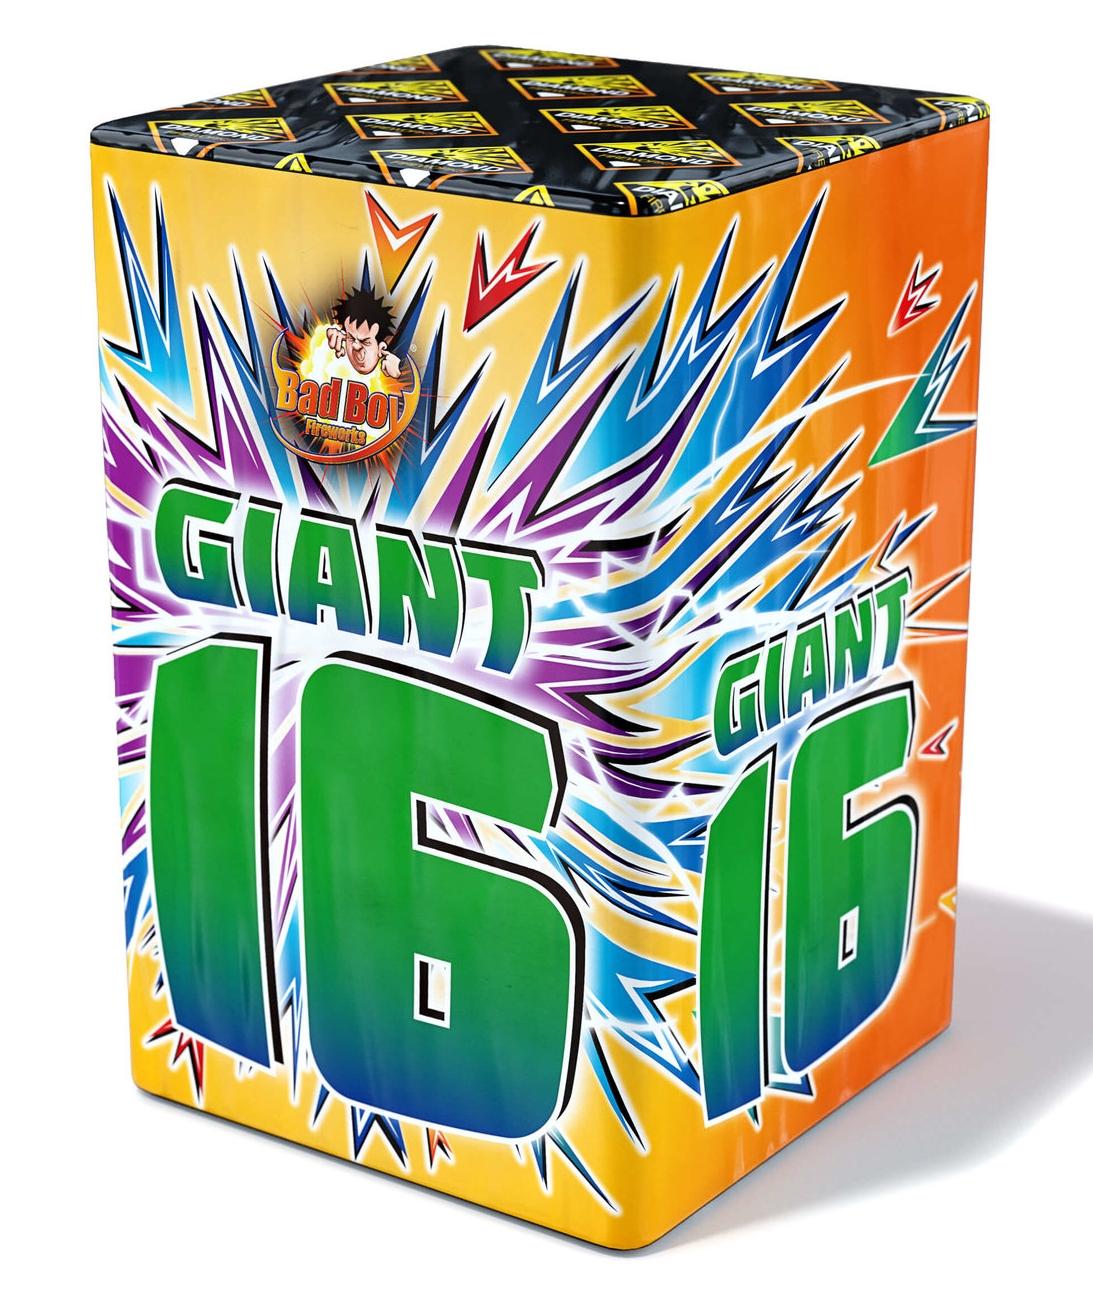 Giant 16 Shot 1.3G - RRP £40.00